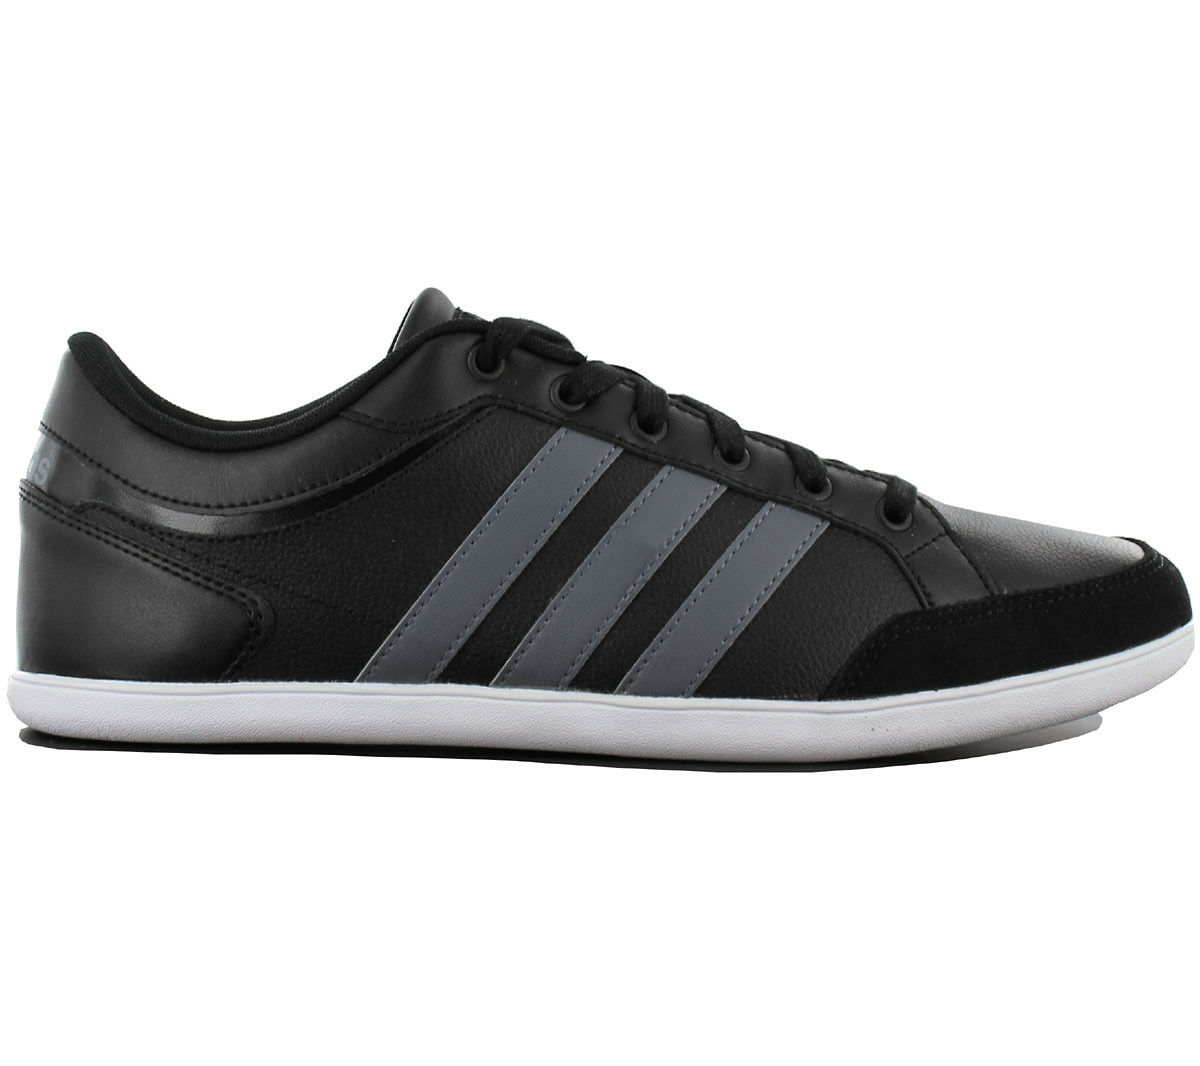 Adidas Unwind Leather scarpe da ginnastica Uomo Moda Scarpe da Ginnastica Tempo Libero